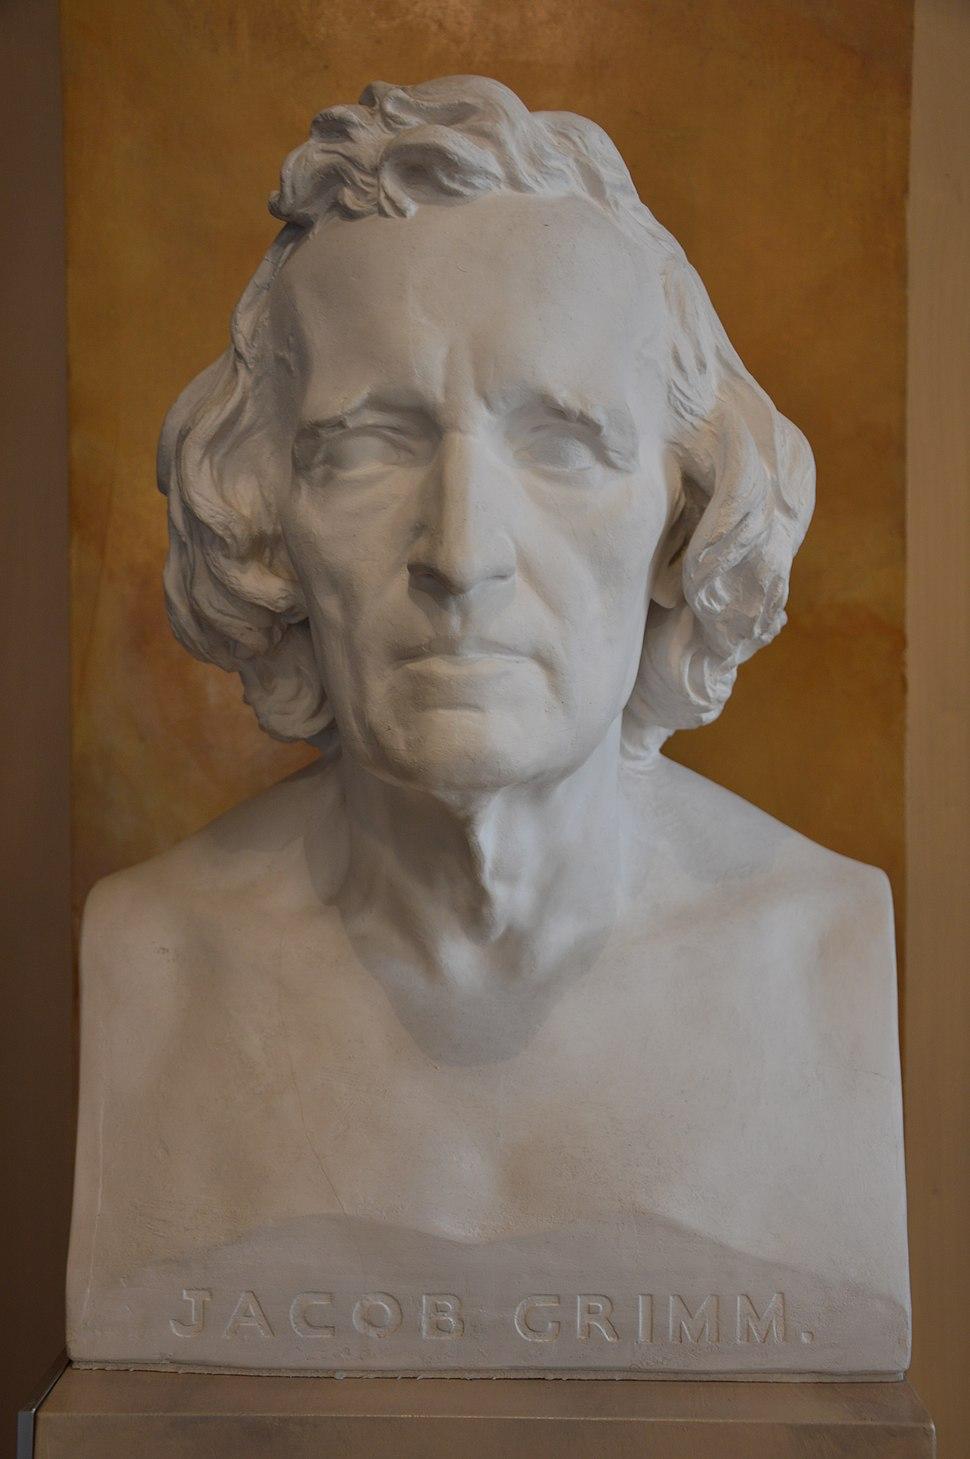 Elisabet Ney - Bust of Jacob Grimm (1856-58)